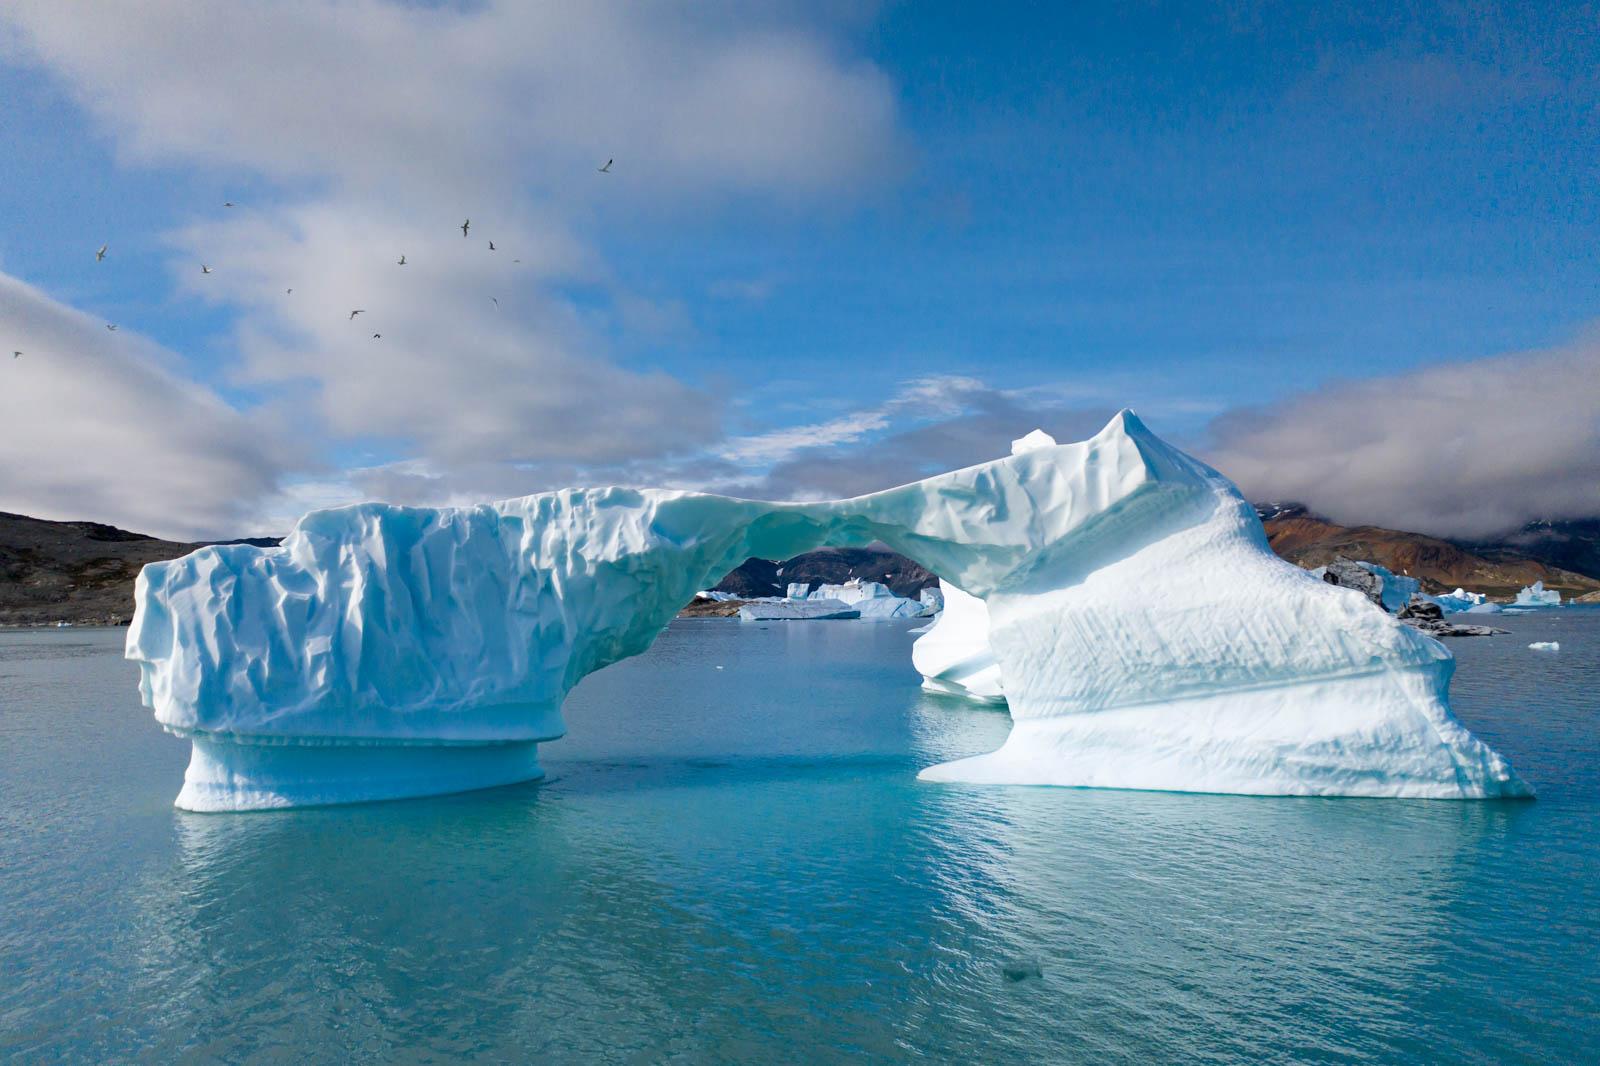 Ostgrönland, Grönland, Eisberg, Drohne, Mavic 2 Pro